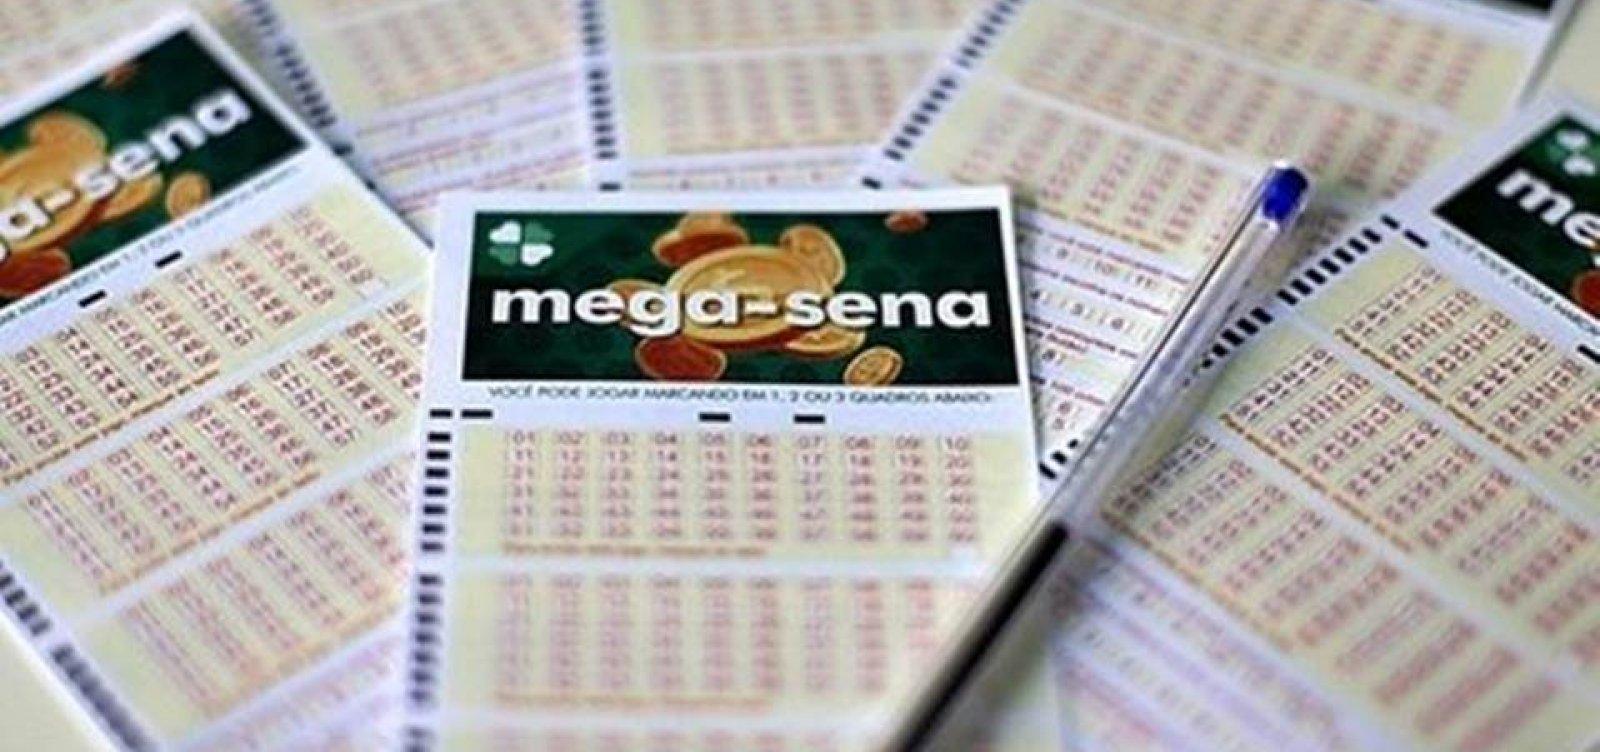 [Mega-Sena: ninguém acerta 6 dezenas e prêmio deve ir a R$ 23 milhões]